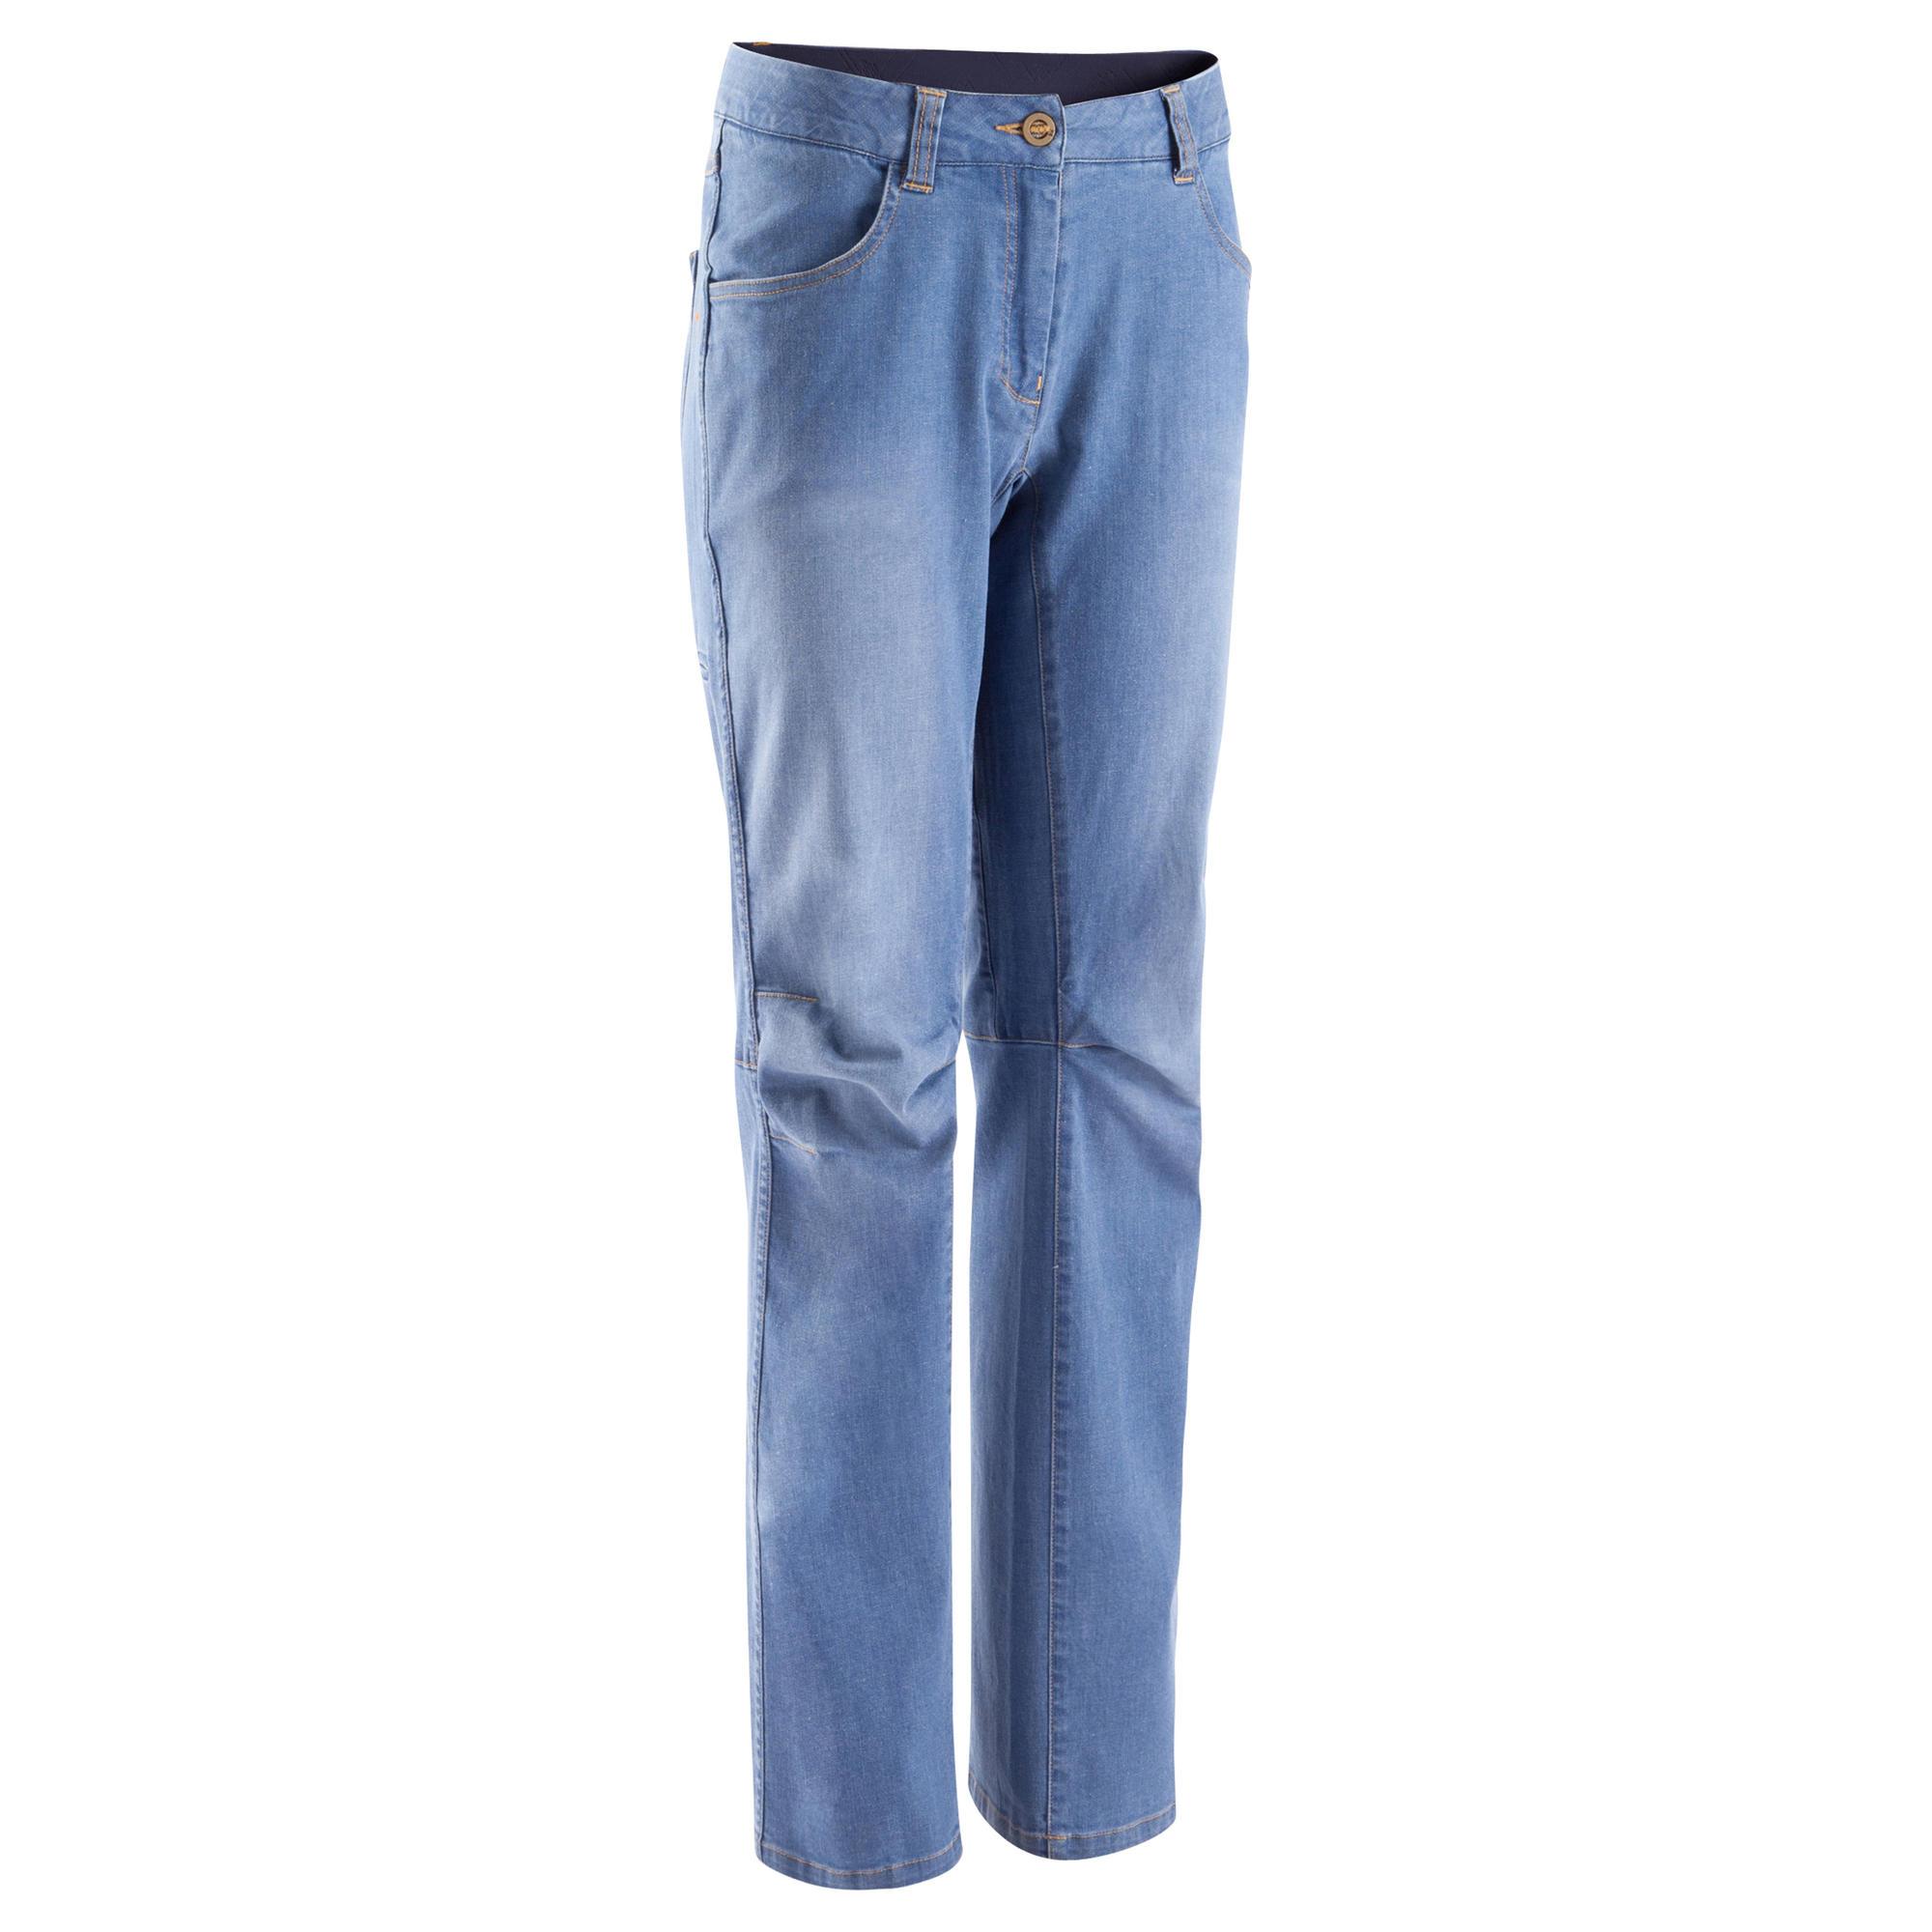 pantalon jean femme 2 used bleu simond. Black Bedroom Furniture Sets. Home Design Ideas